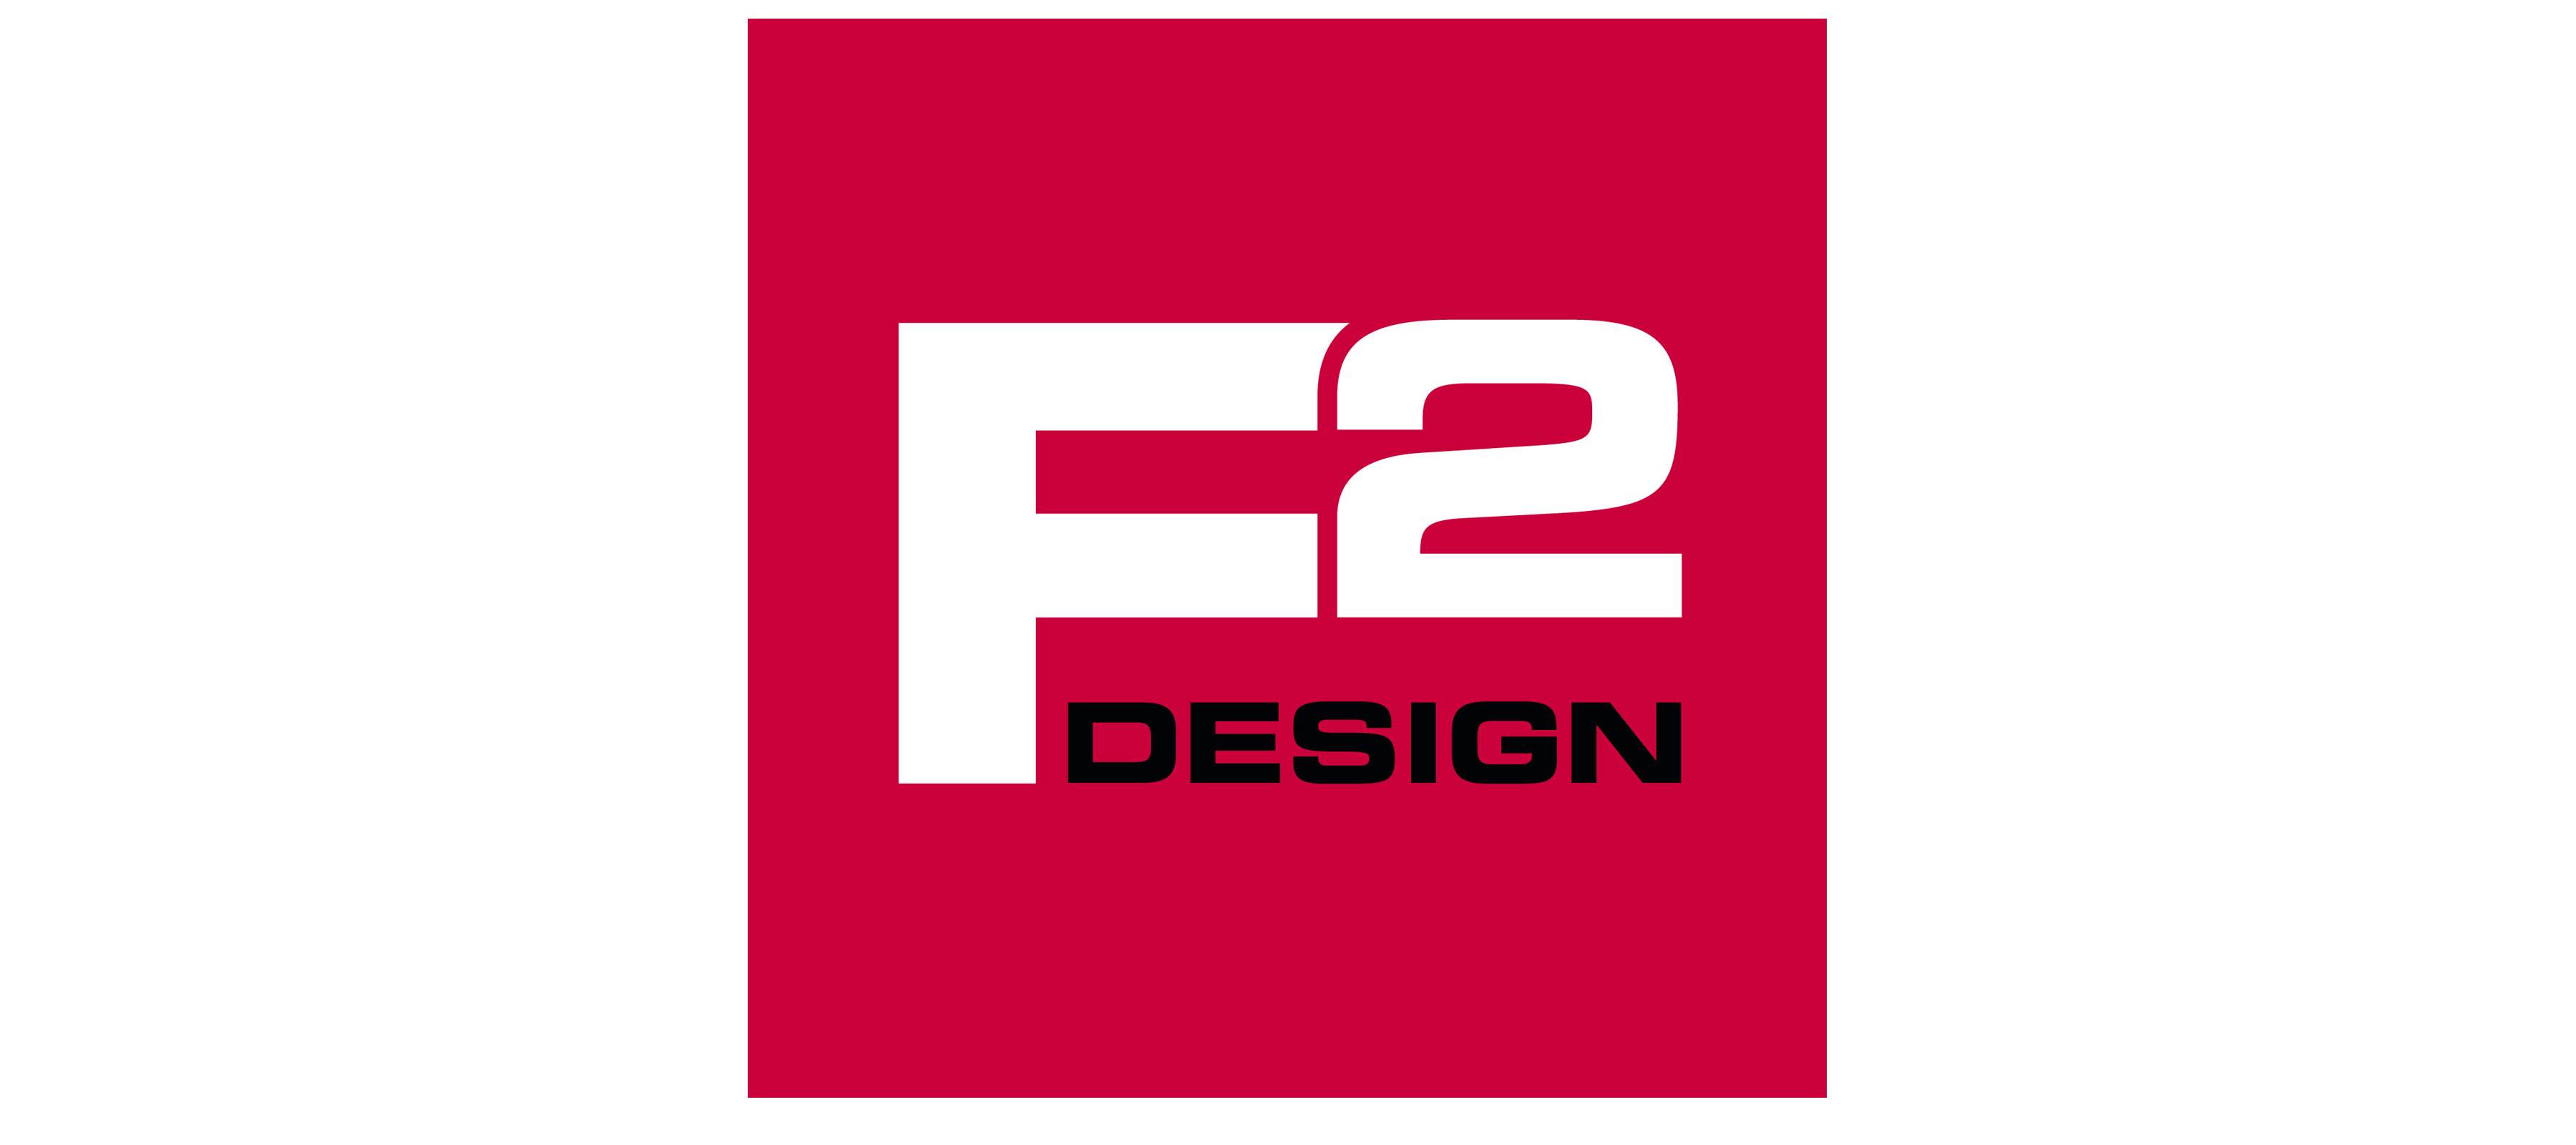 F2 design werbeagentur augsburg f2 design startbild 2 F2 architecture